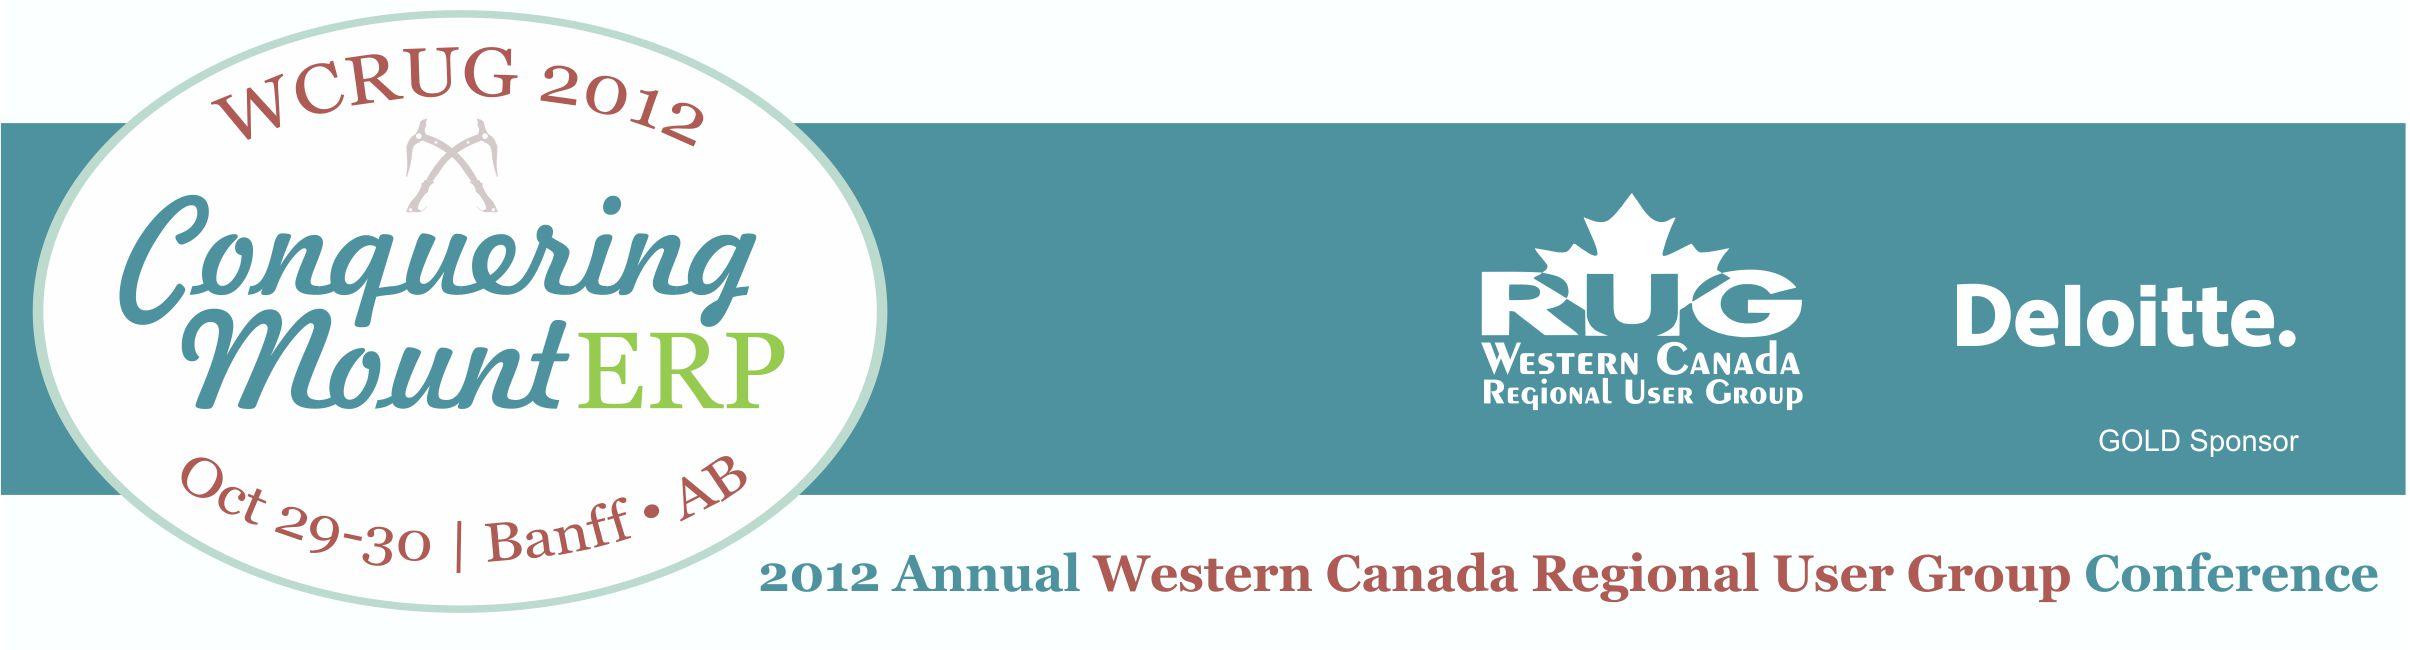 2012 WCRUG Conference_banner